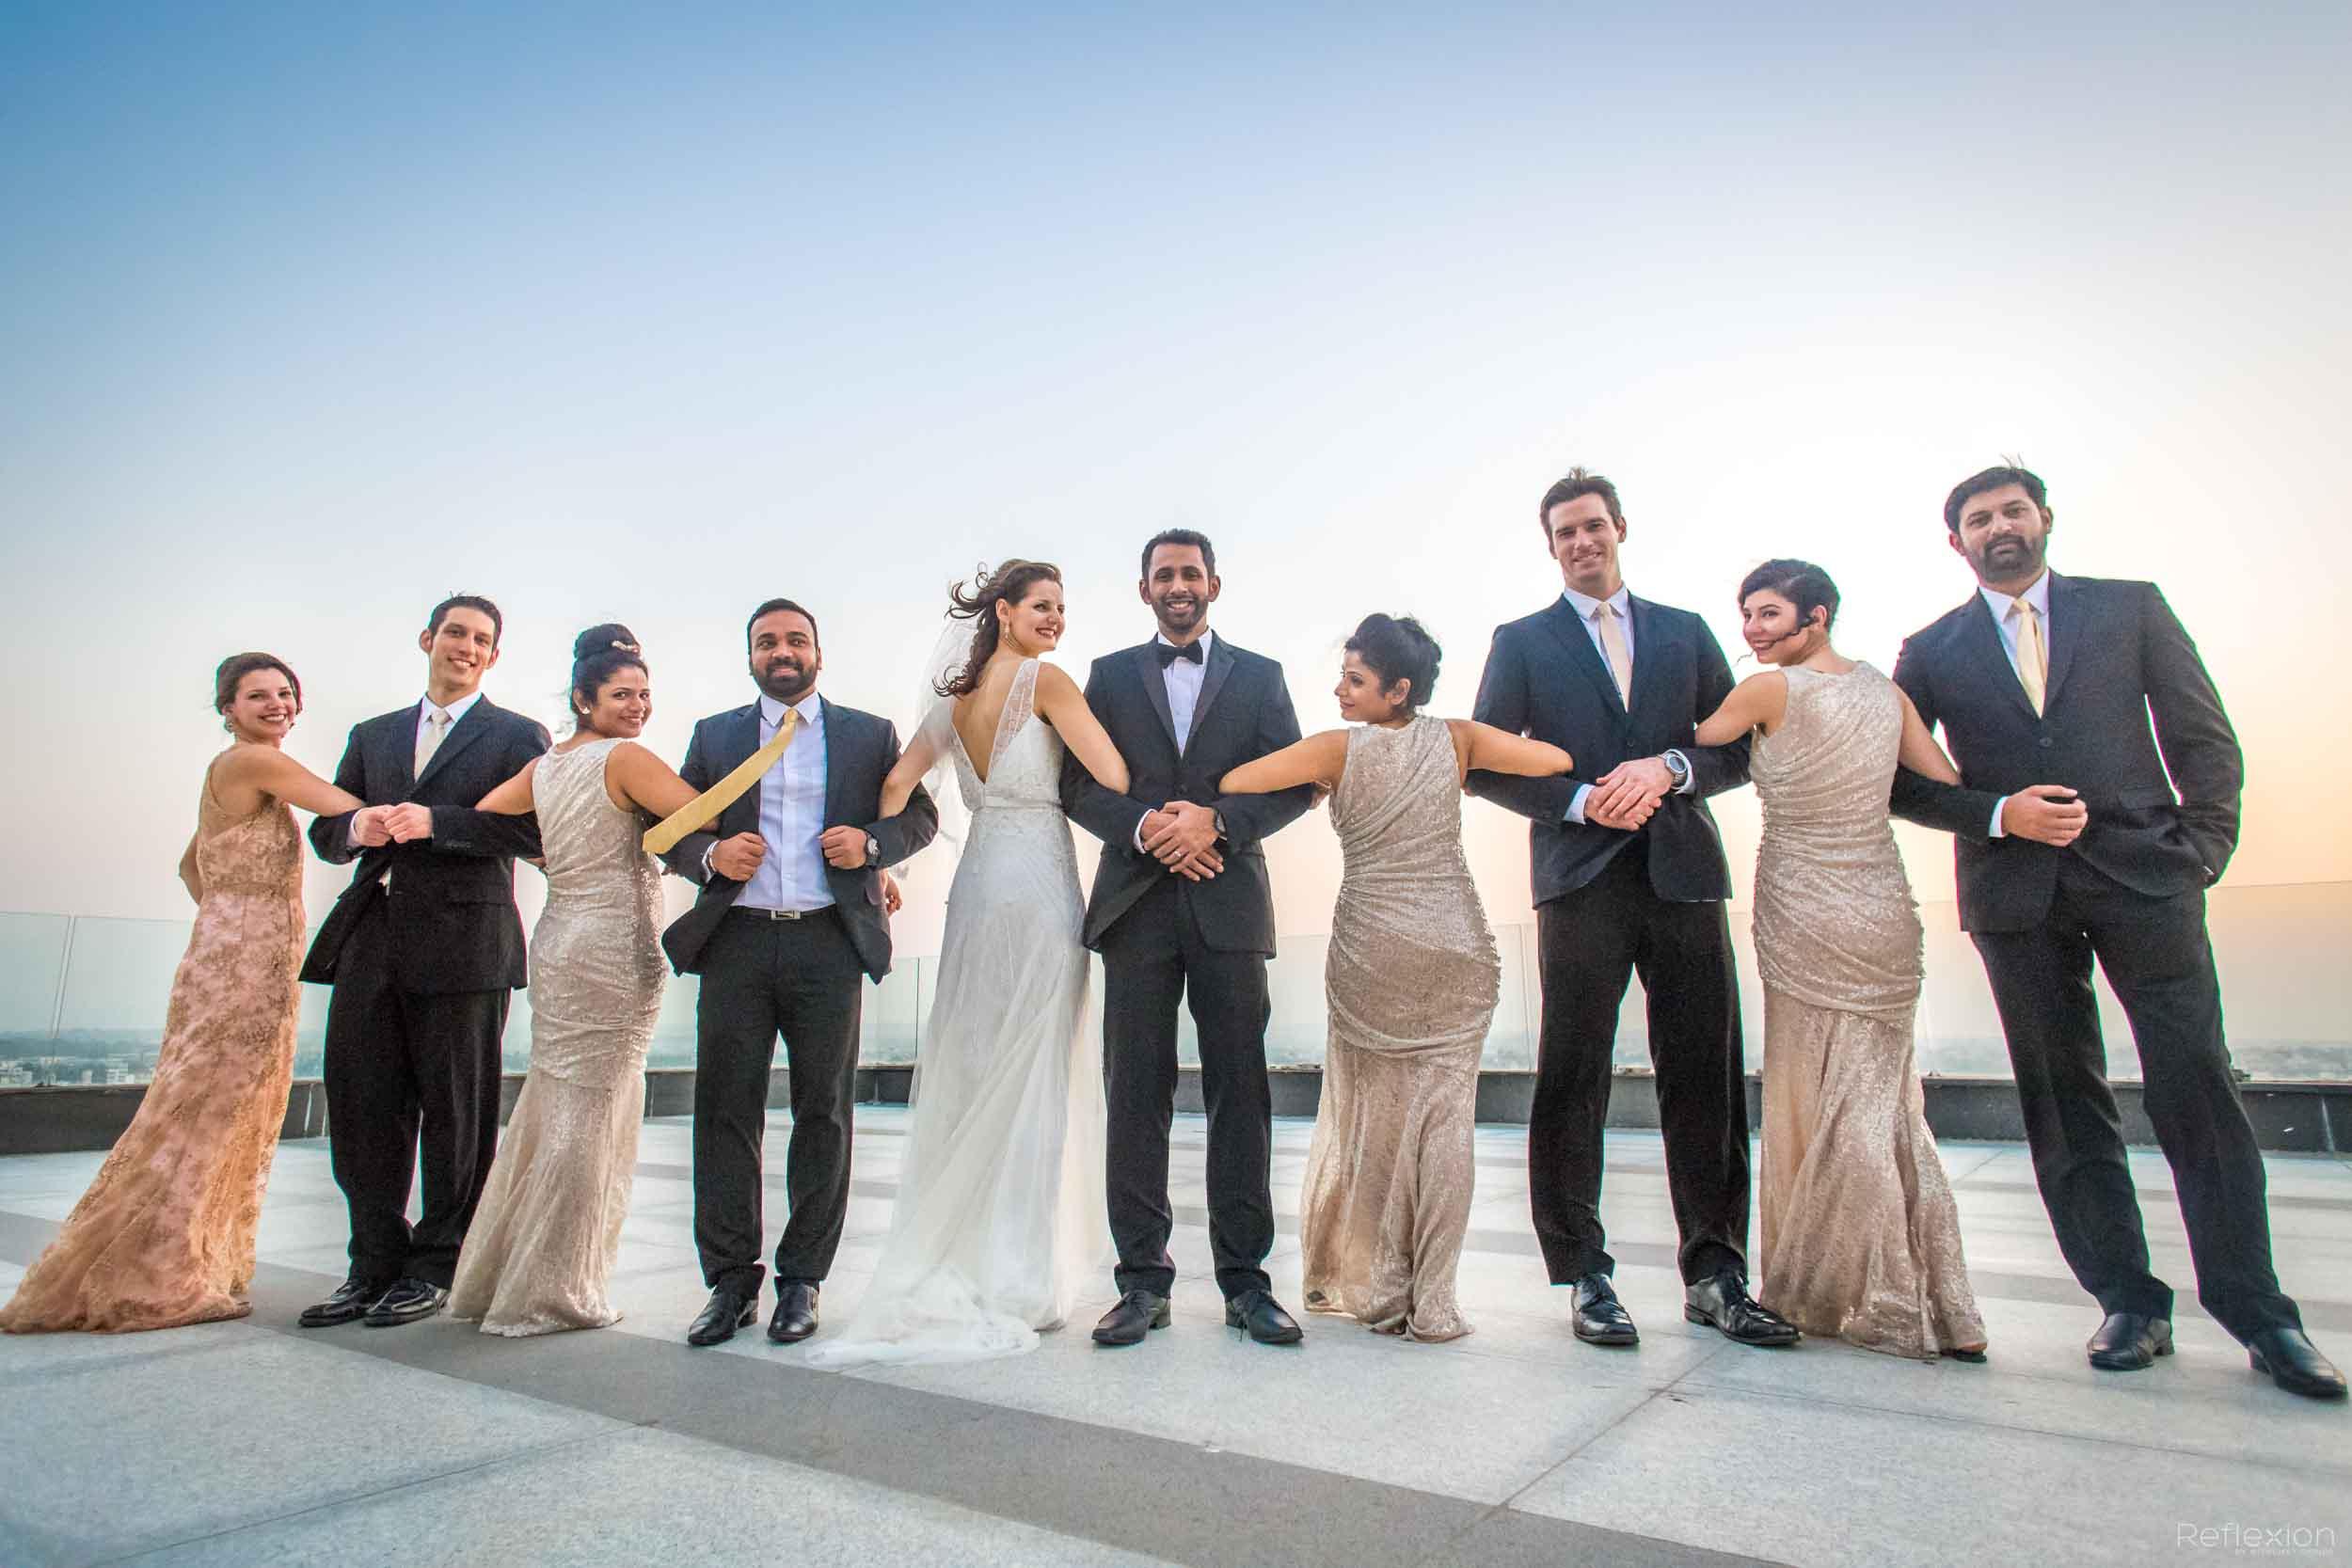 american-indian-wedding-64.jpg